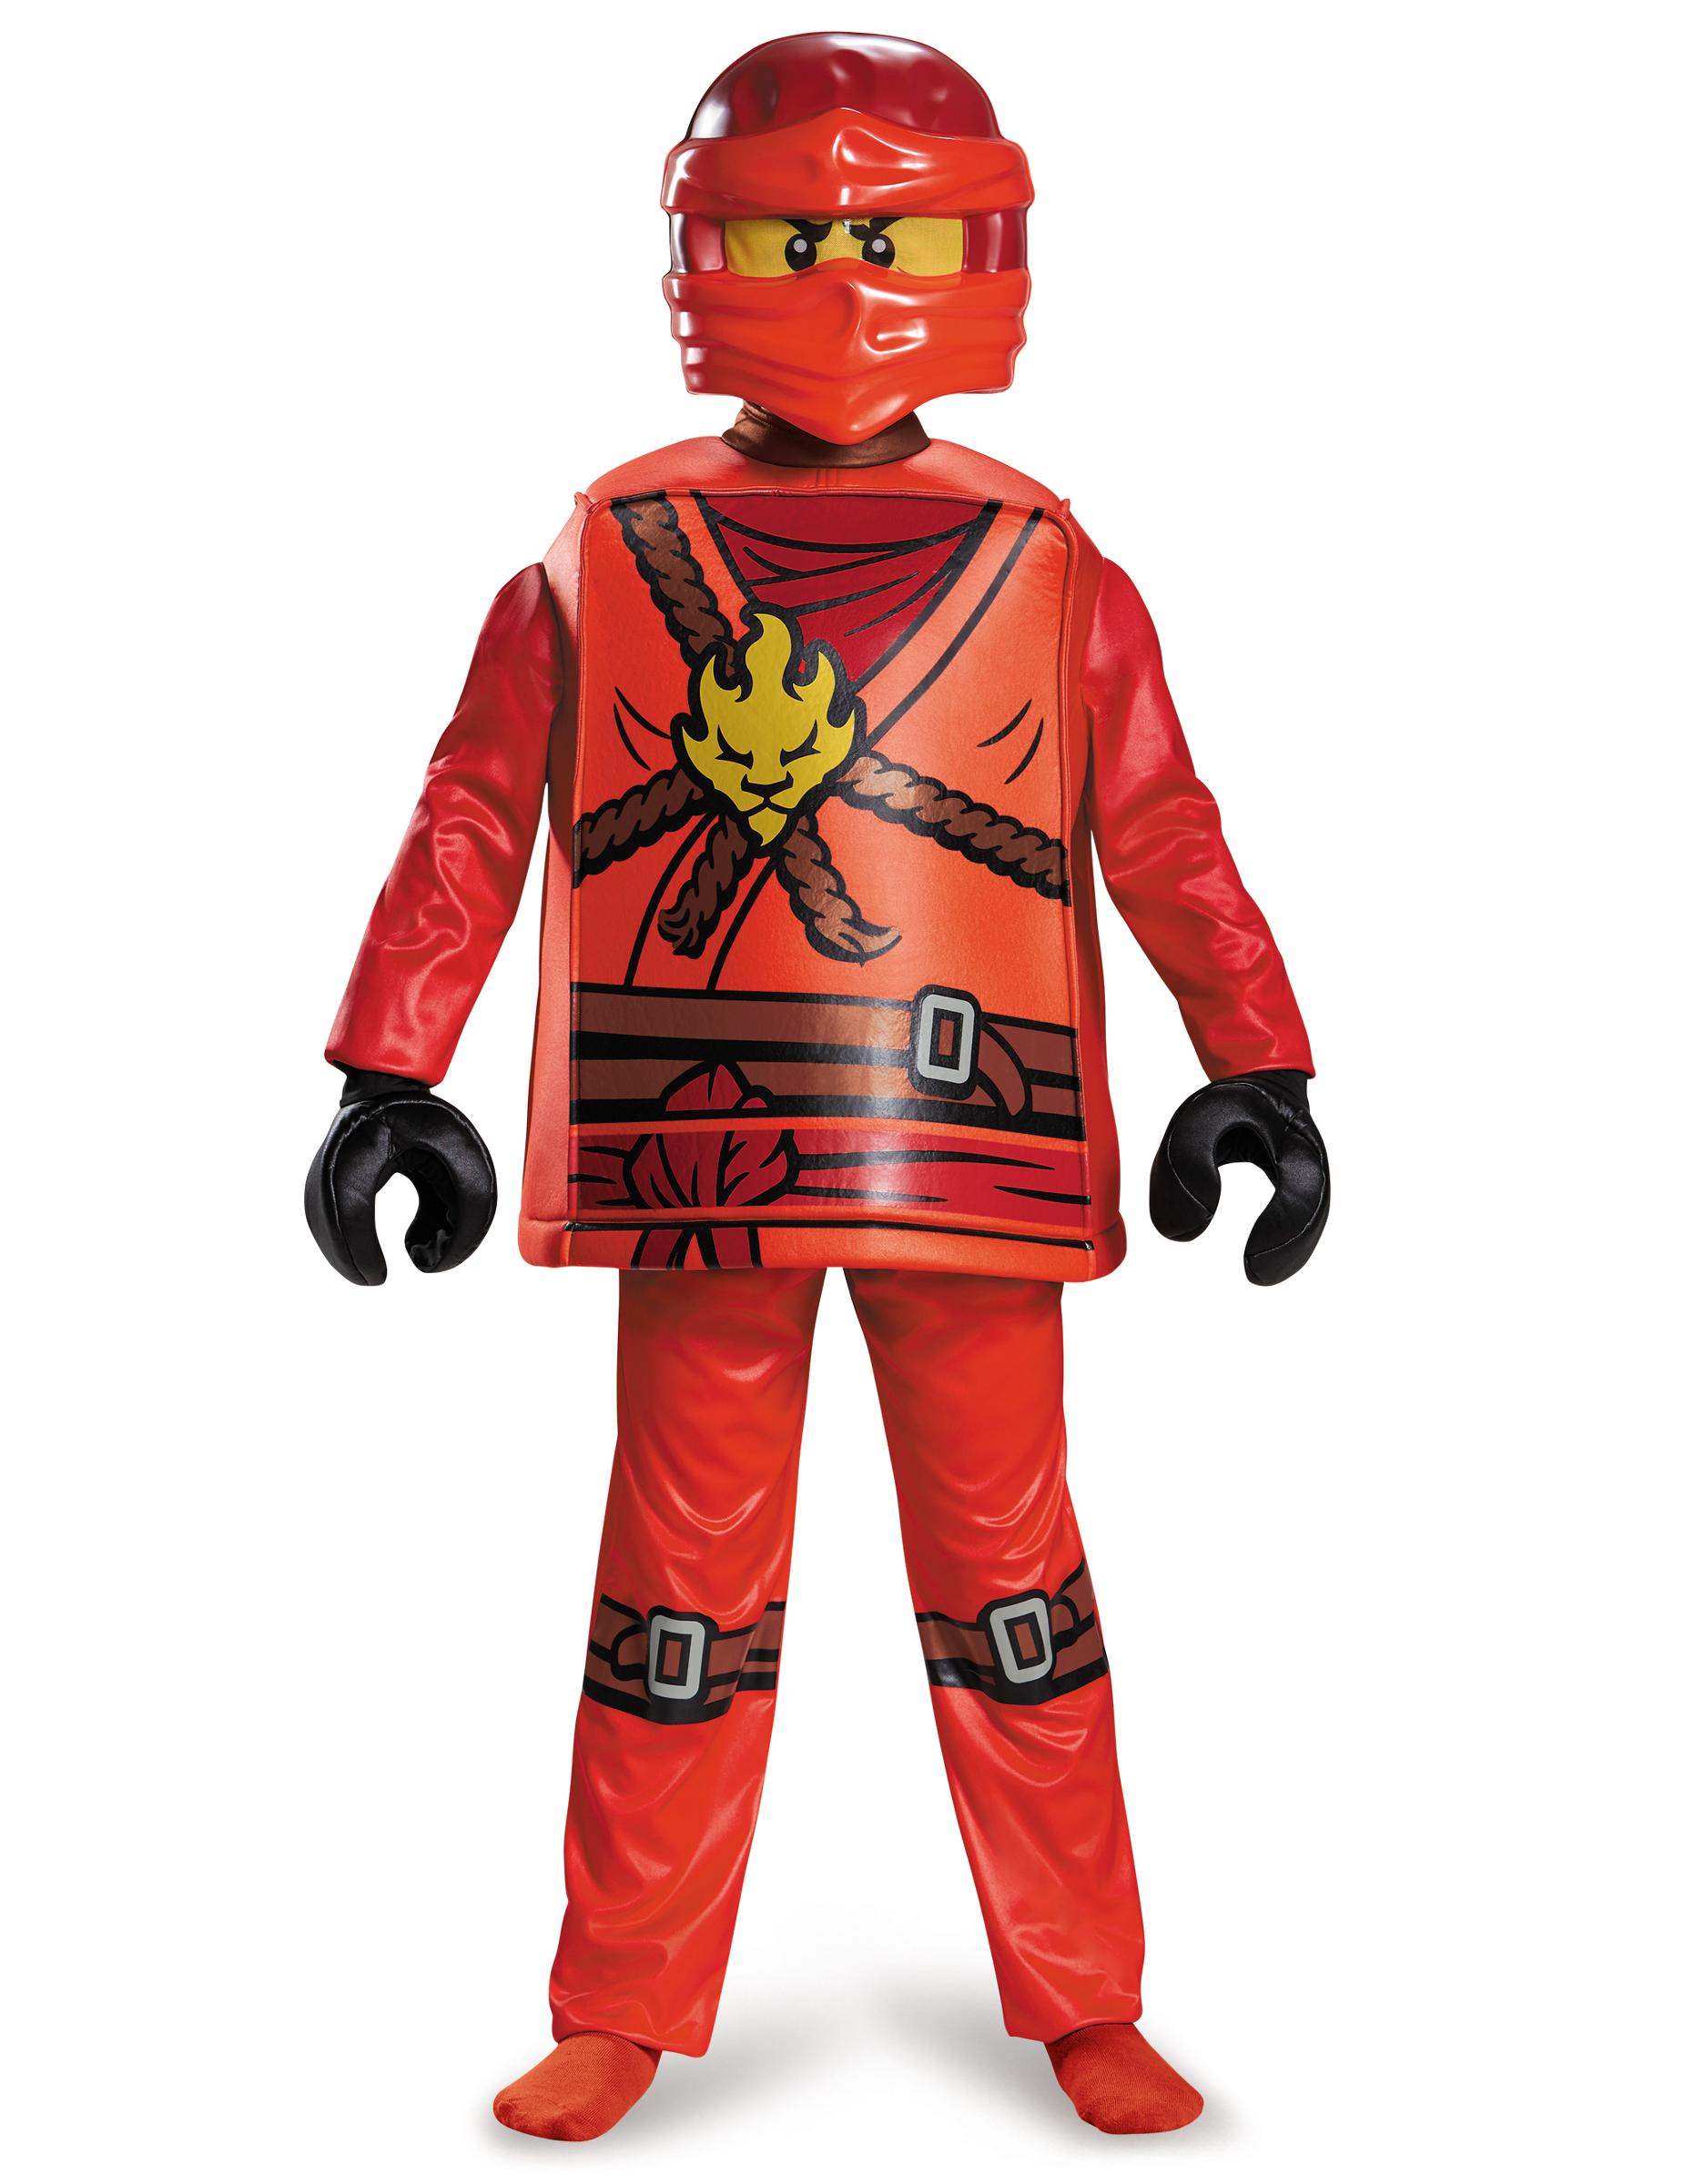 dguisement deluxe kai ninjago lego enfant - Ninjago Rouge